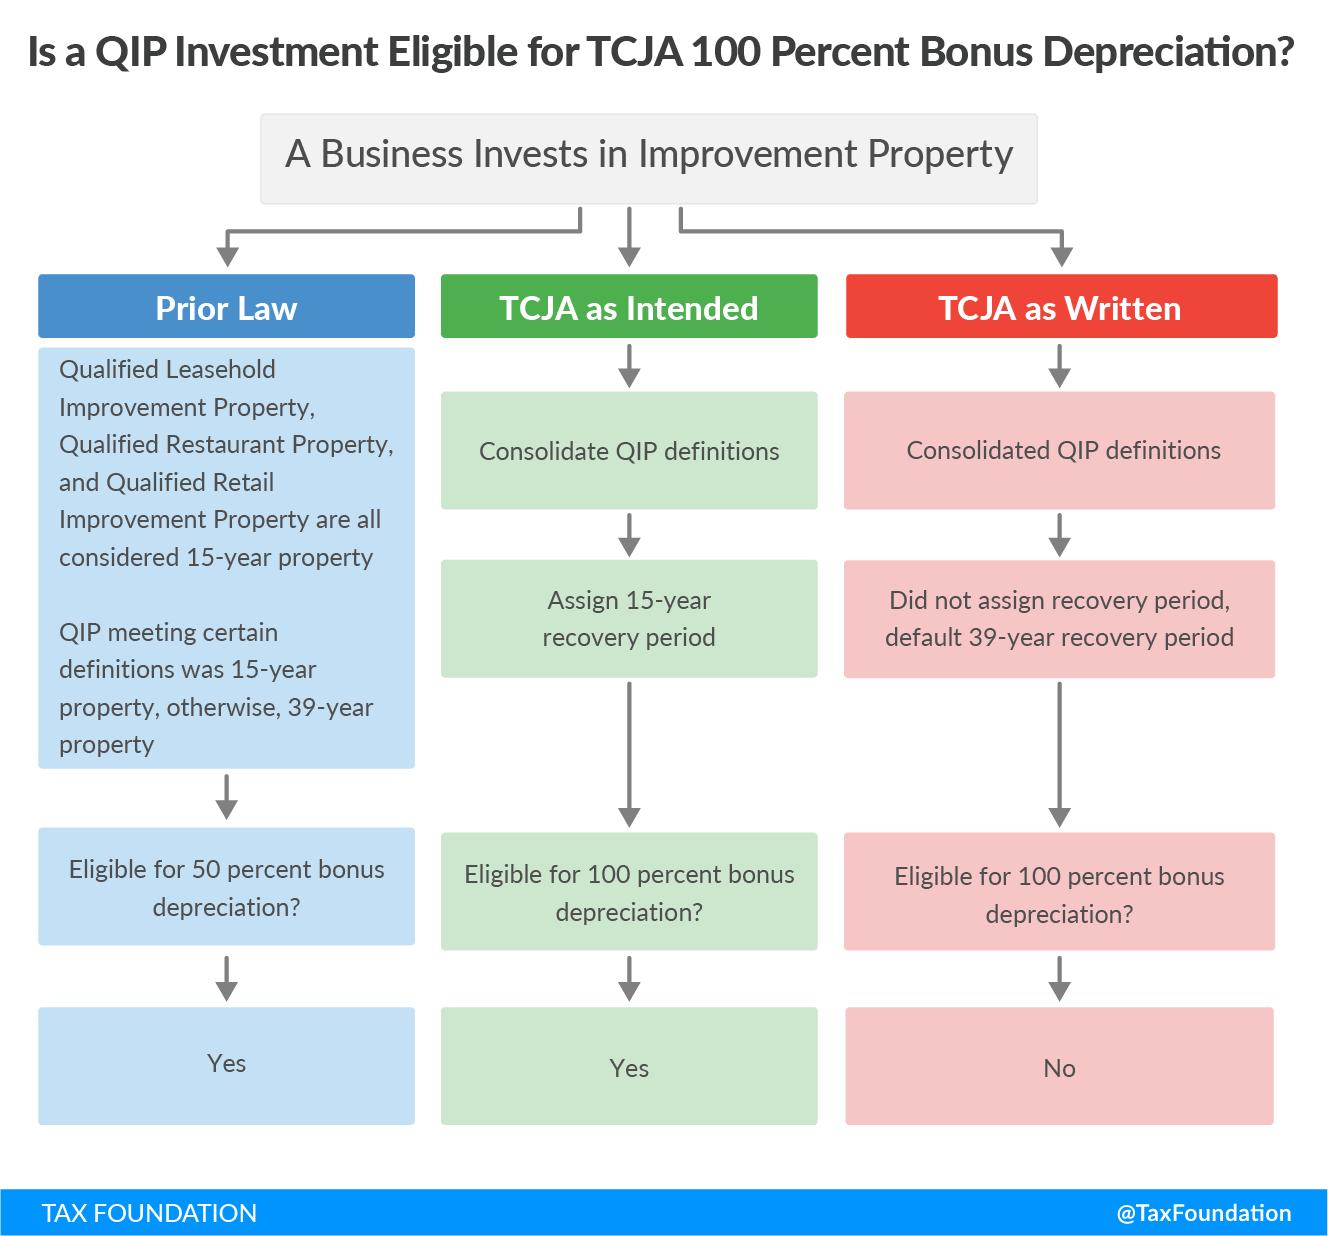 Is a QIP Investment Eligible for TCJA 100 Percent Bonus Depreciation?